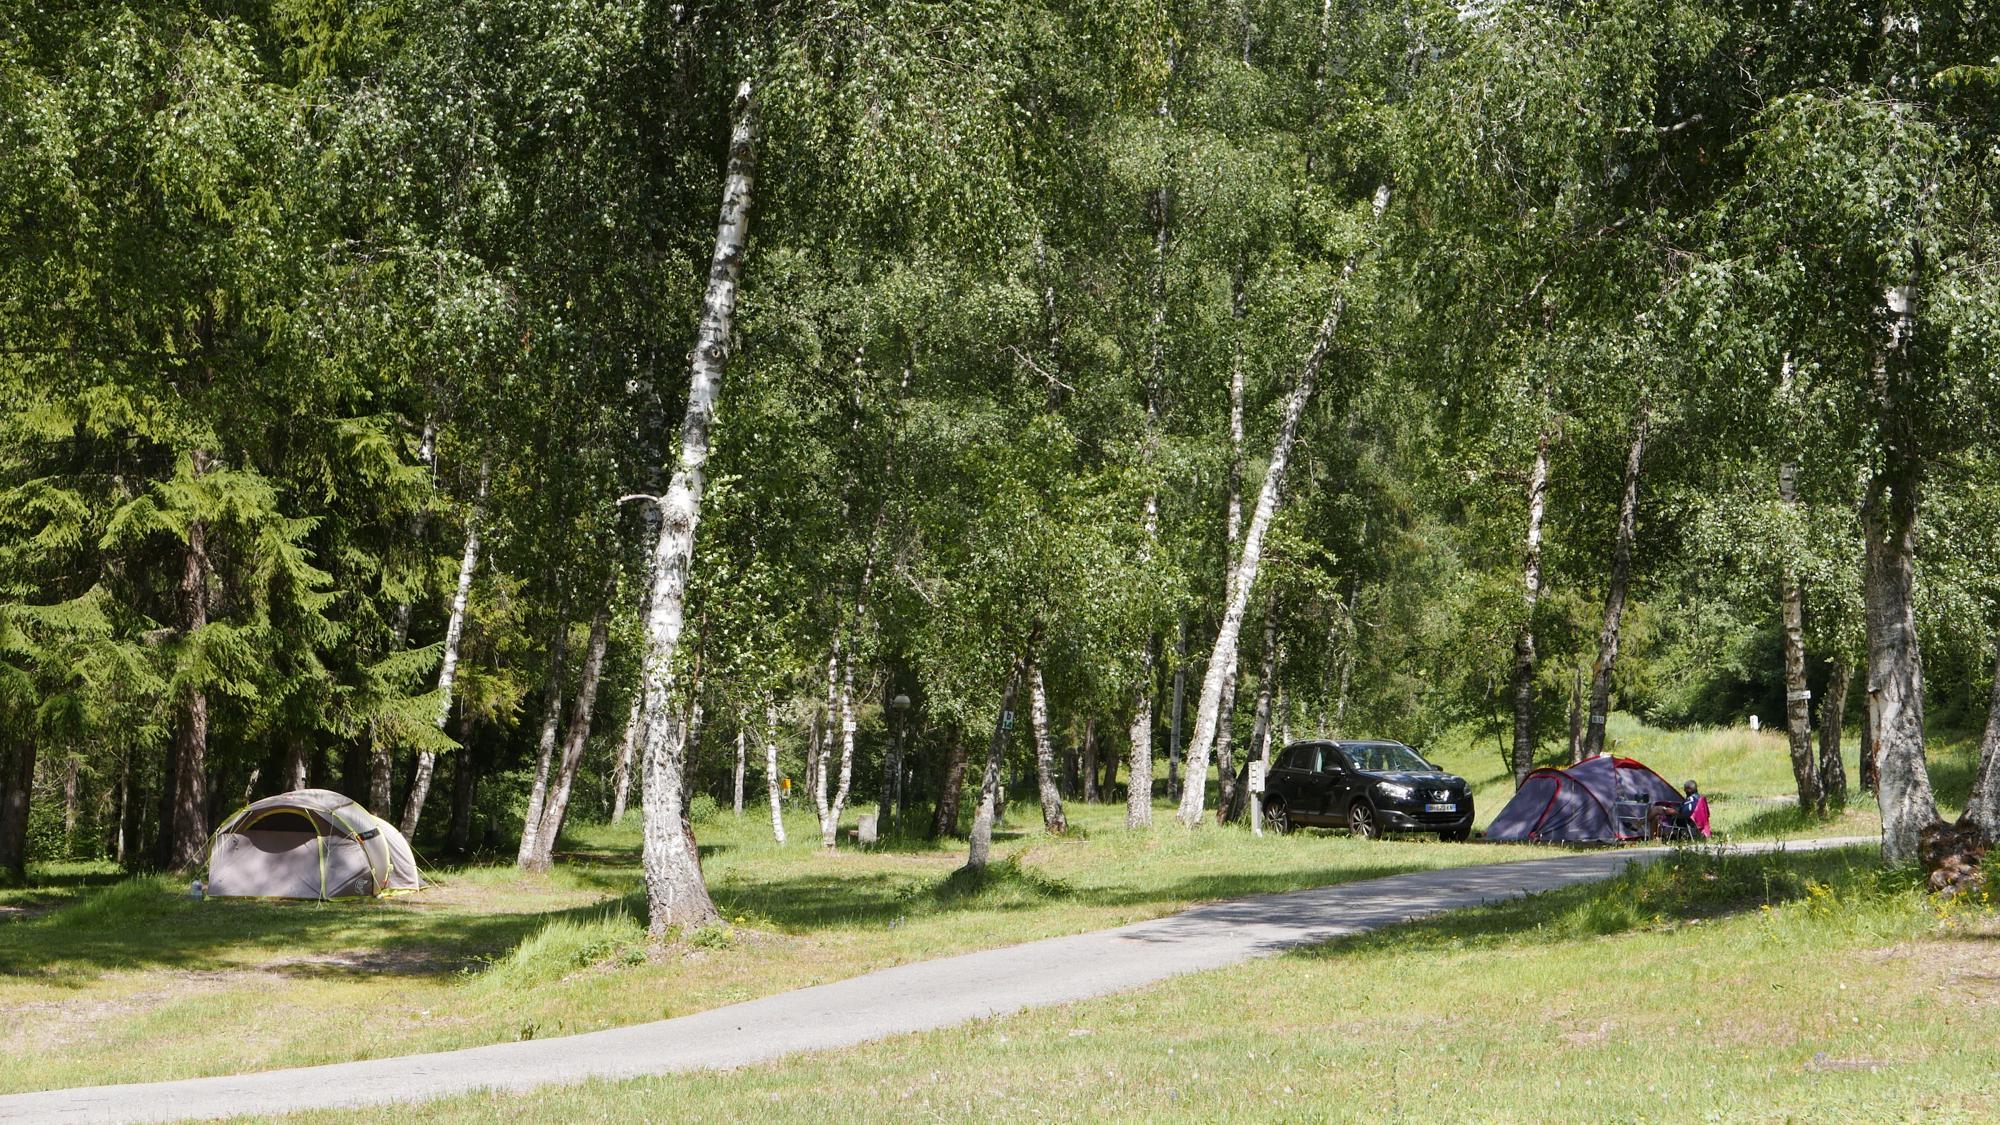 Campsites in Huttopia – I Love This Campsite